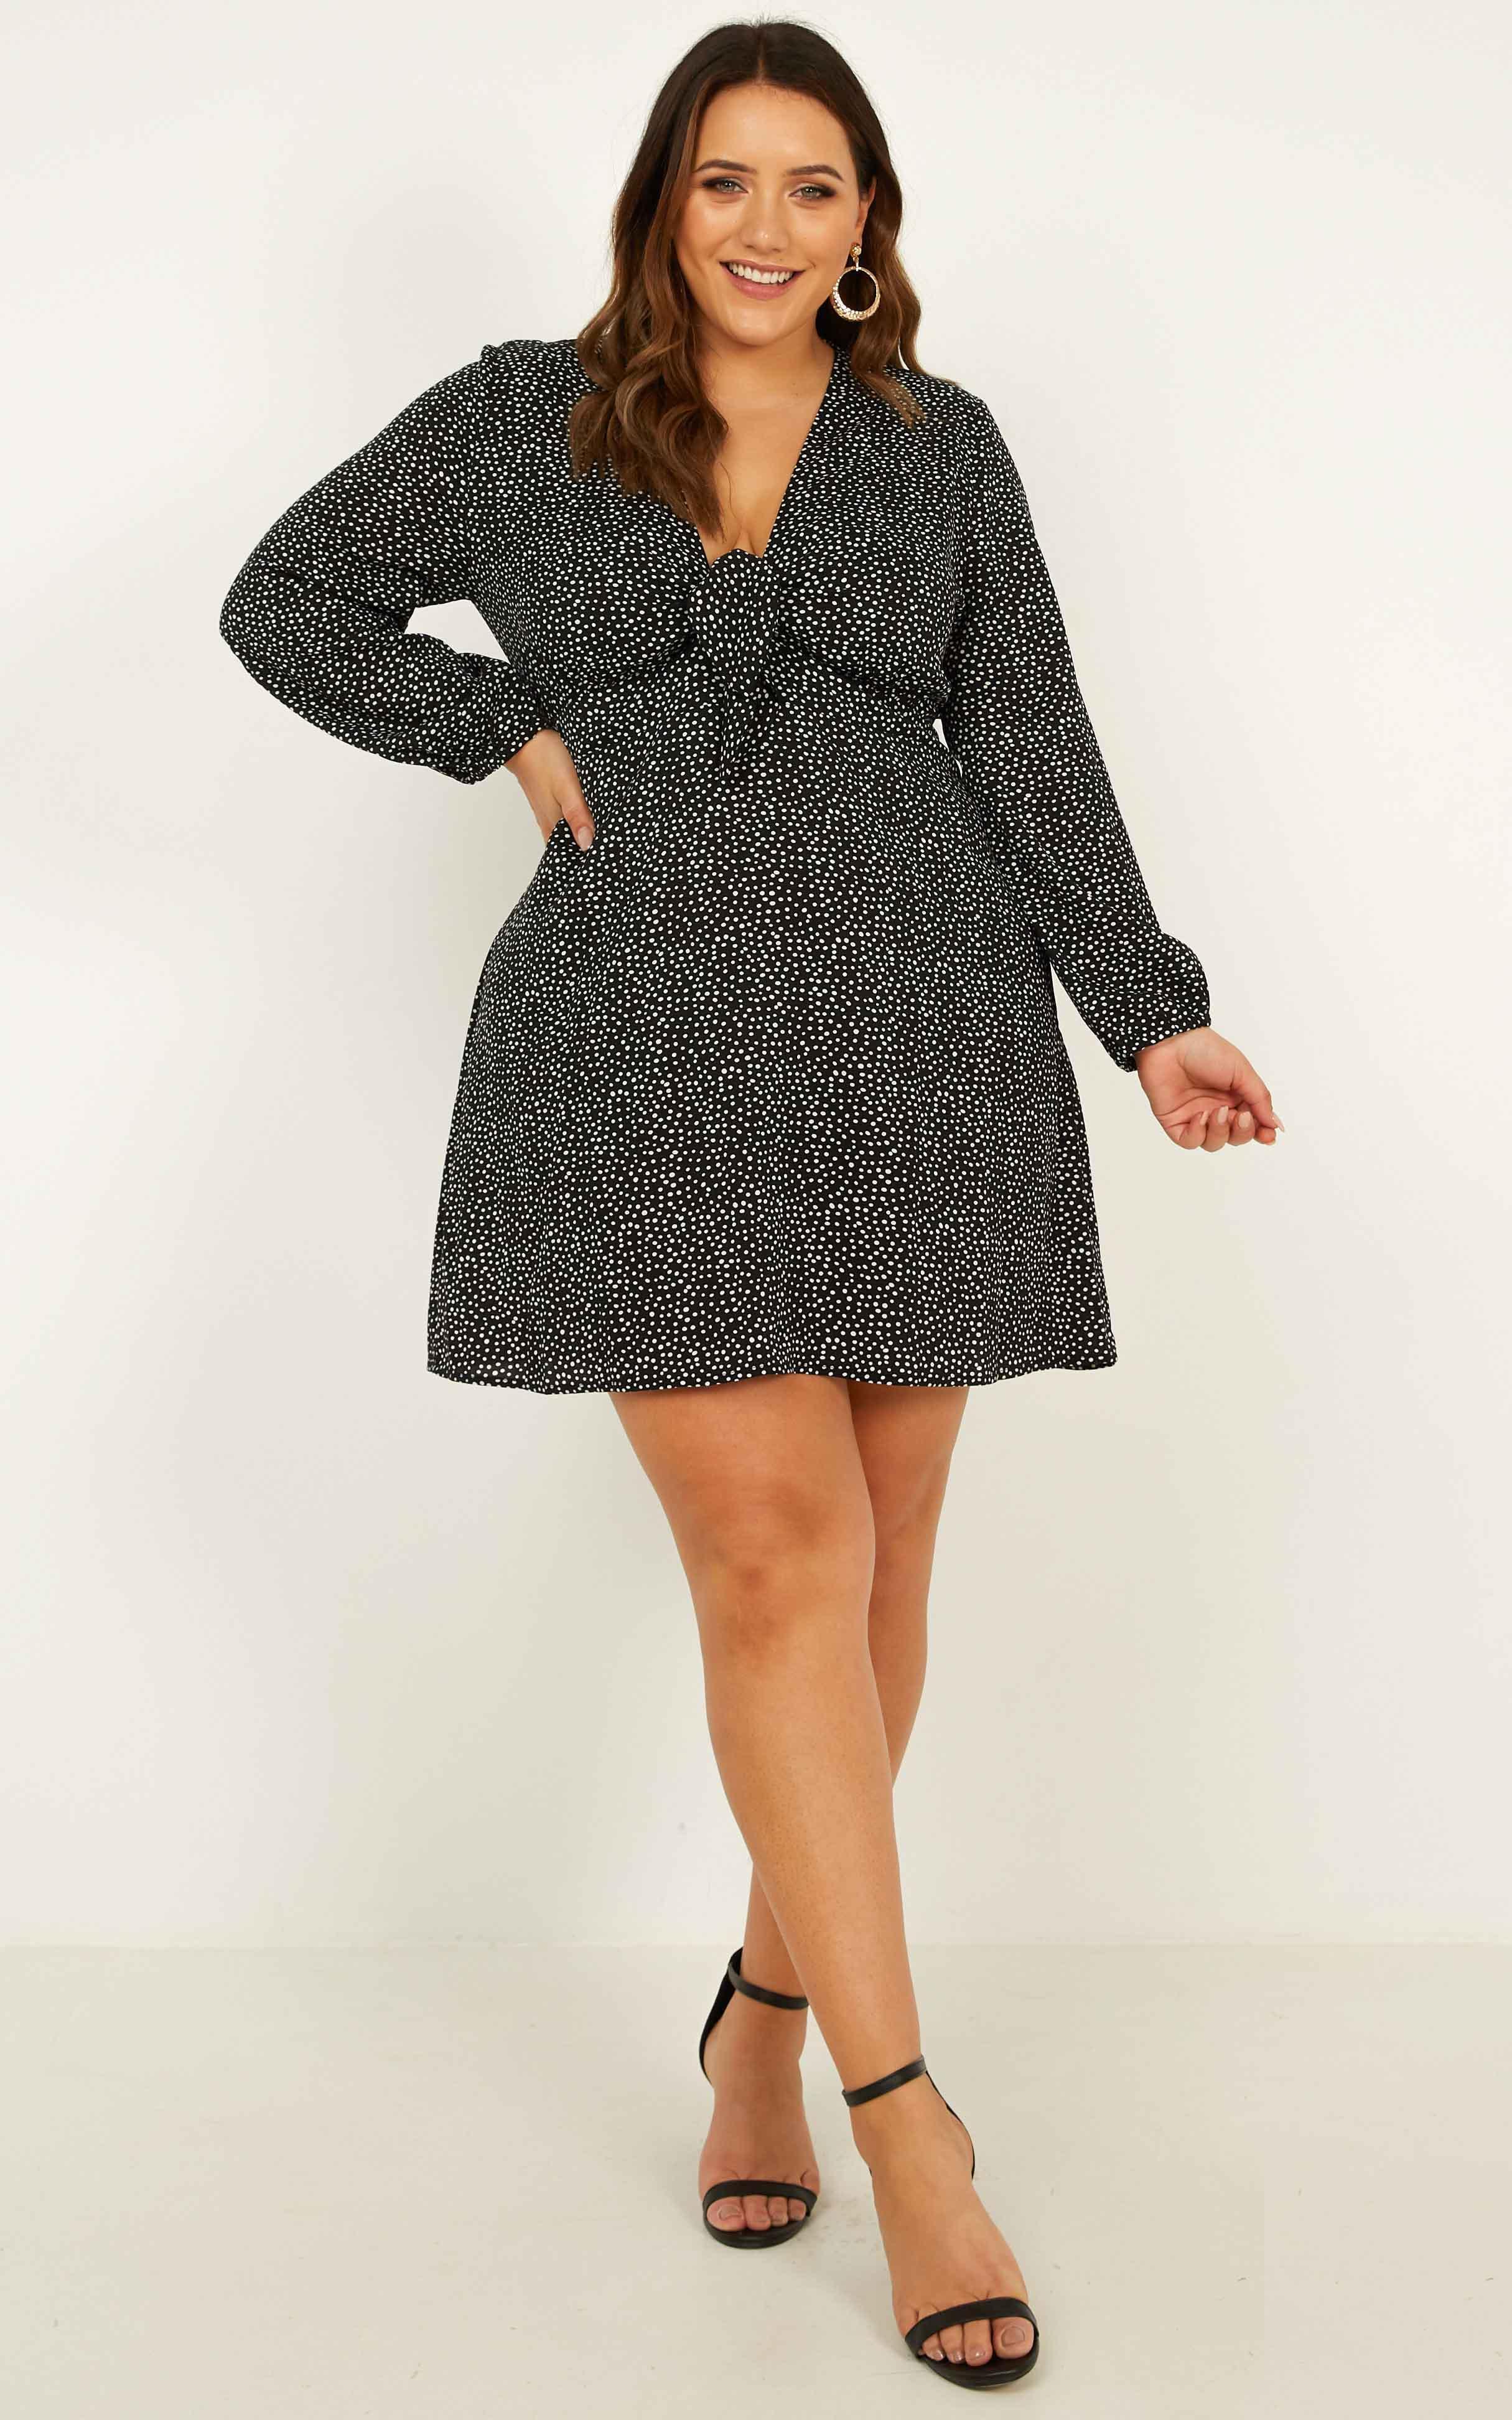 My Heart Girl Dress In black spot - 14 (XL), Black, hi-res image number null